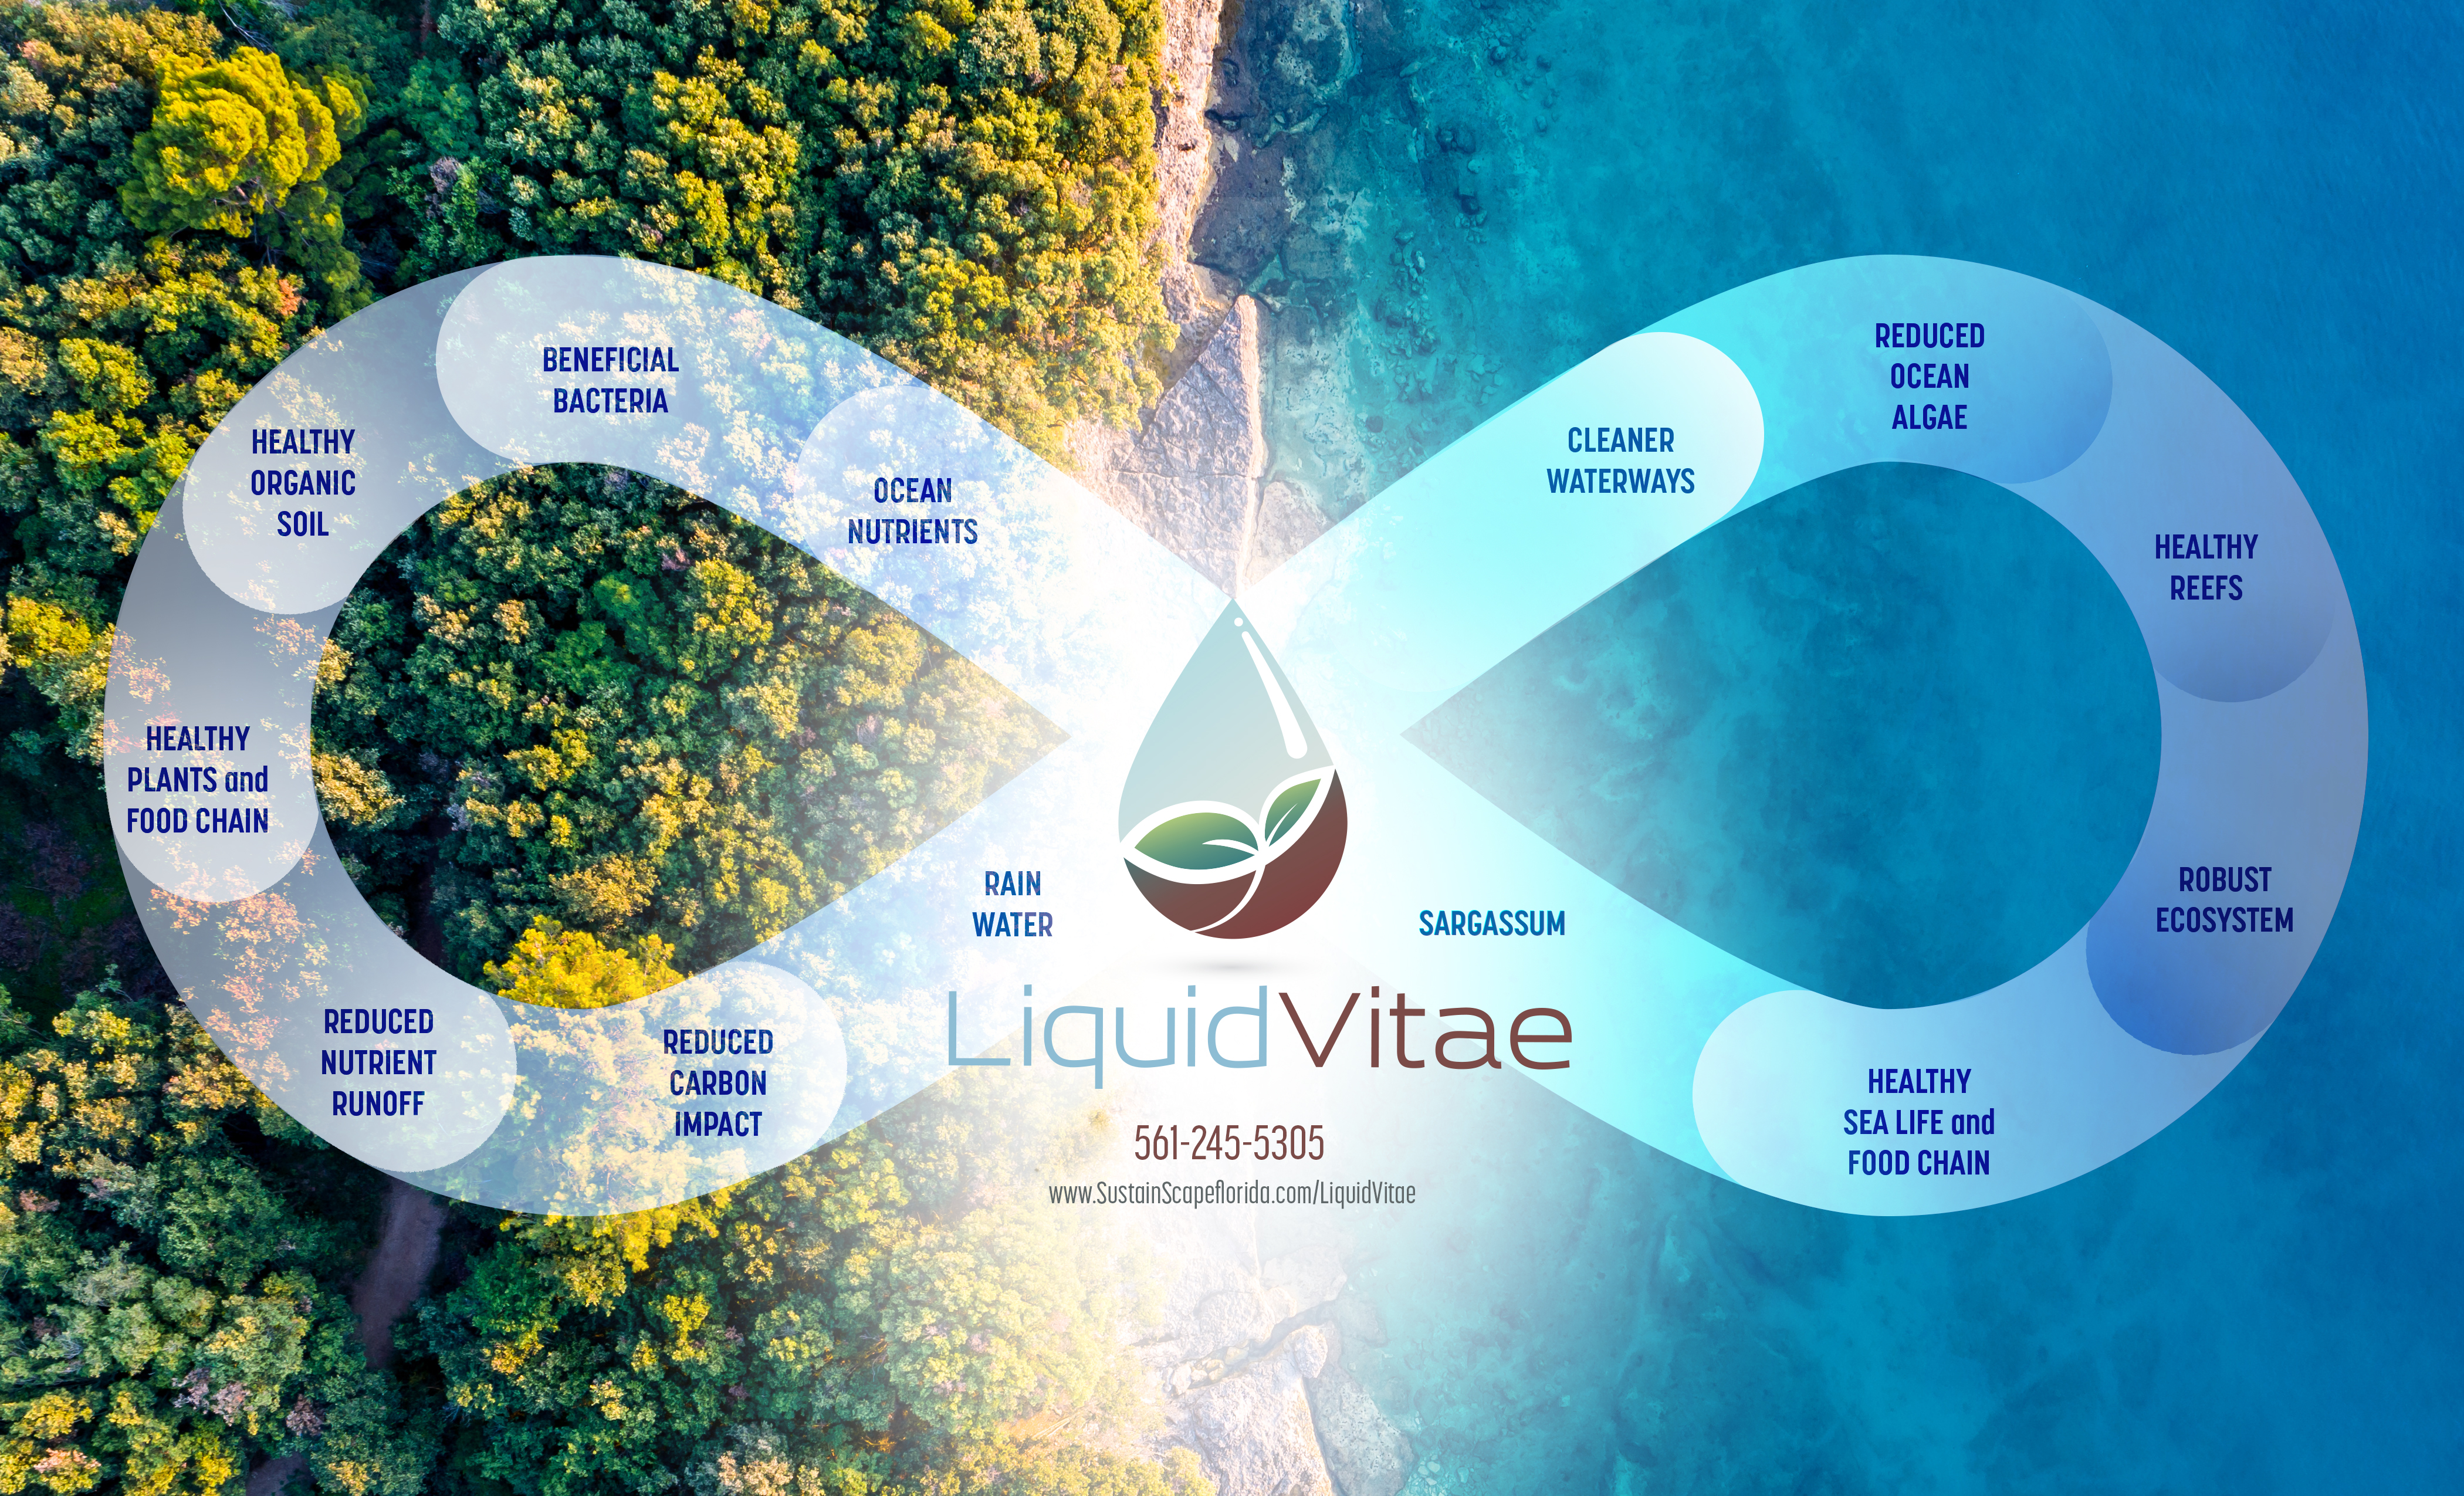 Organic Fertilizer in Boca Raton, Palm Beach, Liquid Vitae